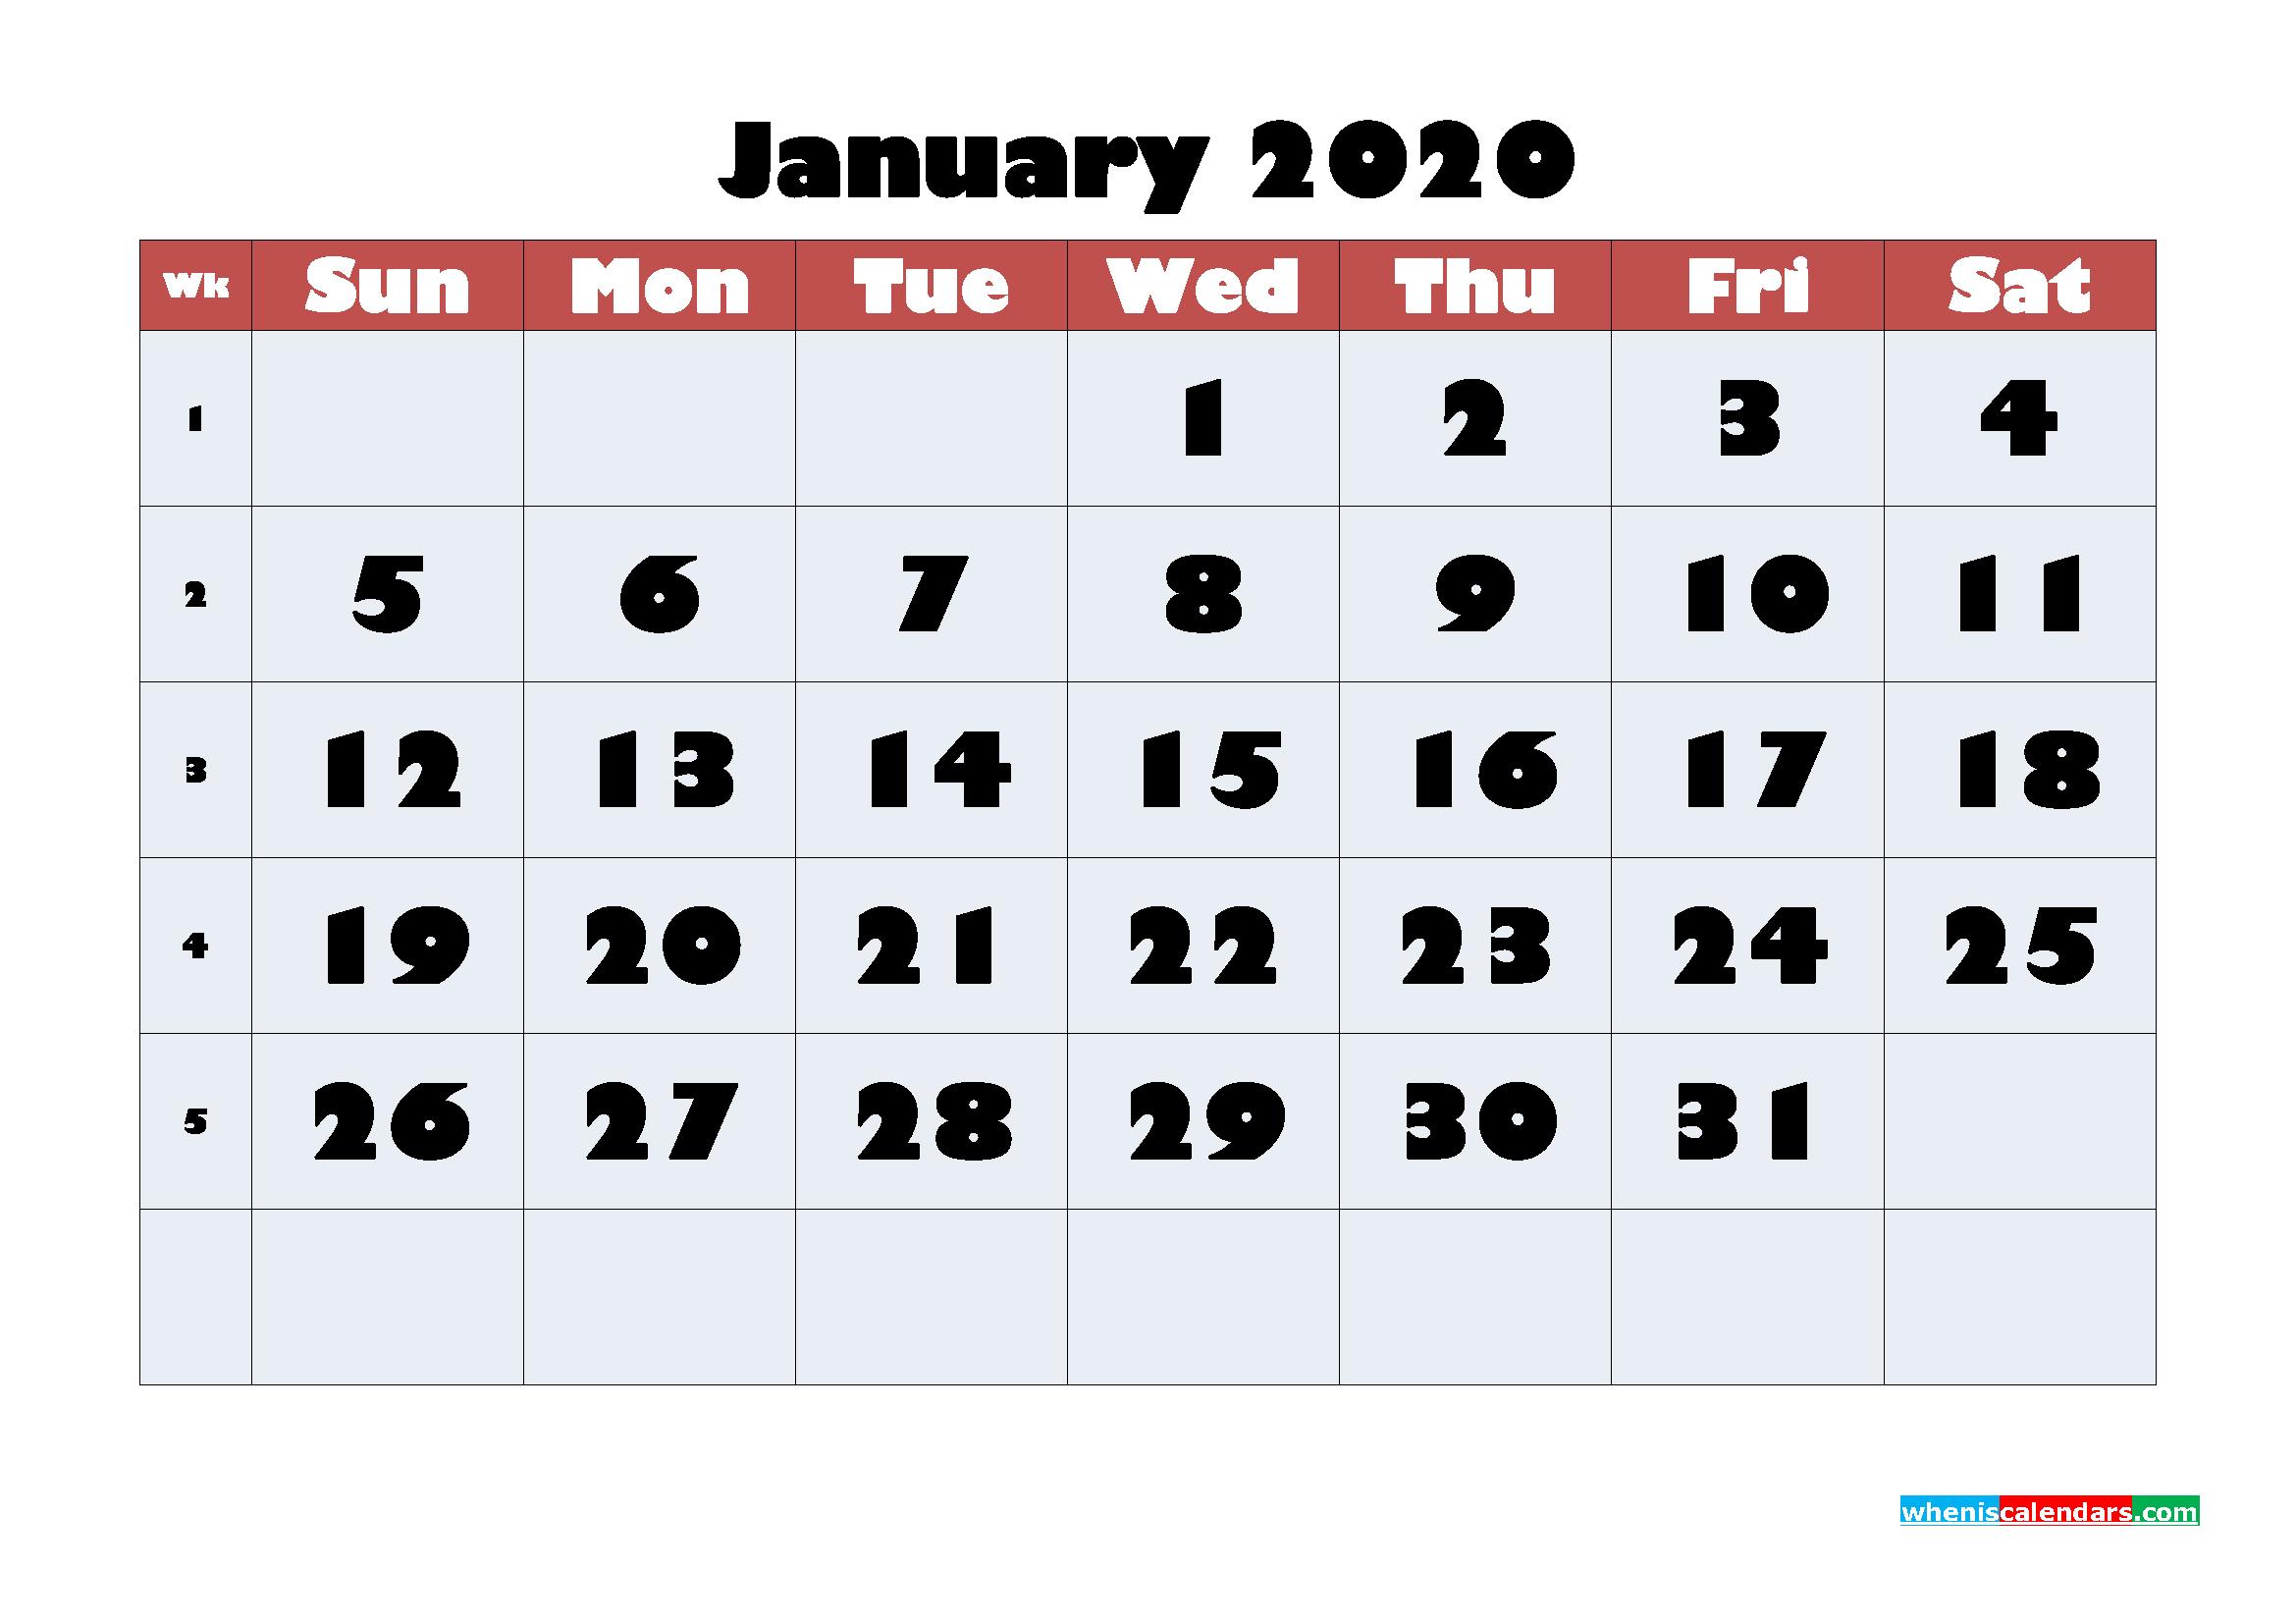 Free Blank Calendar January 2020 Printable - No.m20b613